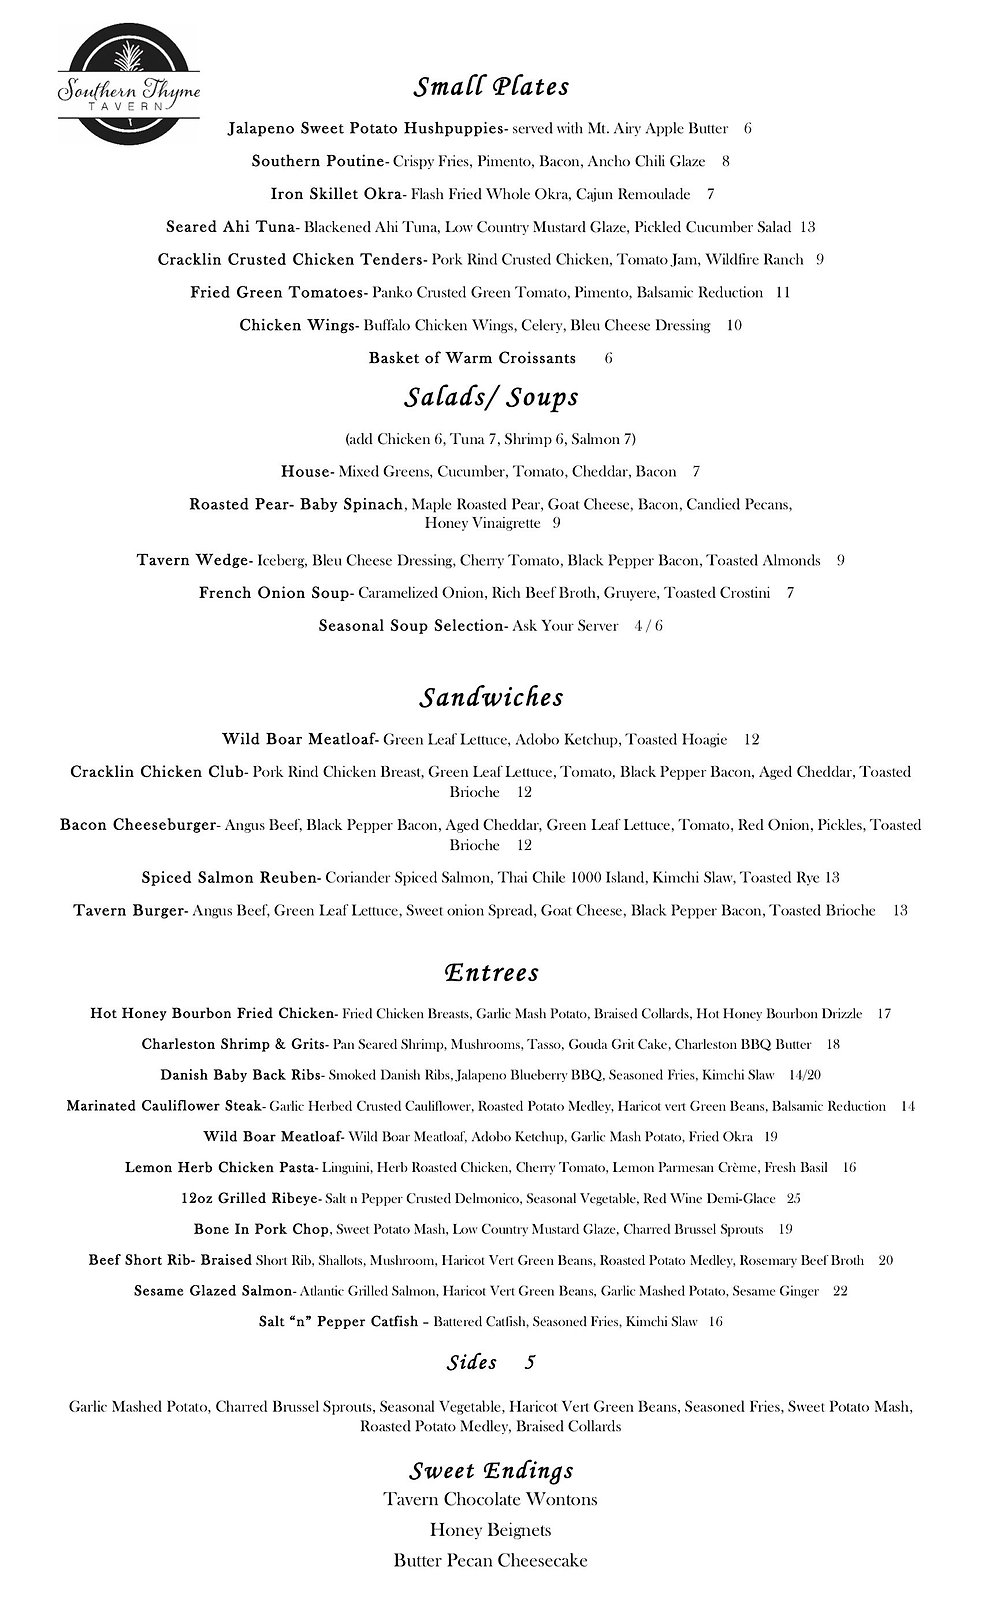 Southern Thyme Tavern Menu 8.5 x 14.jpg